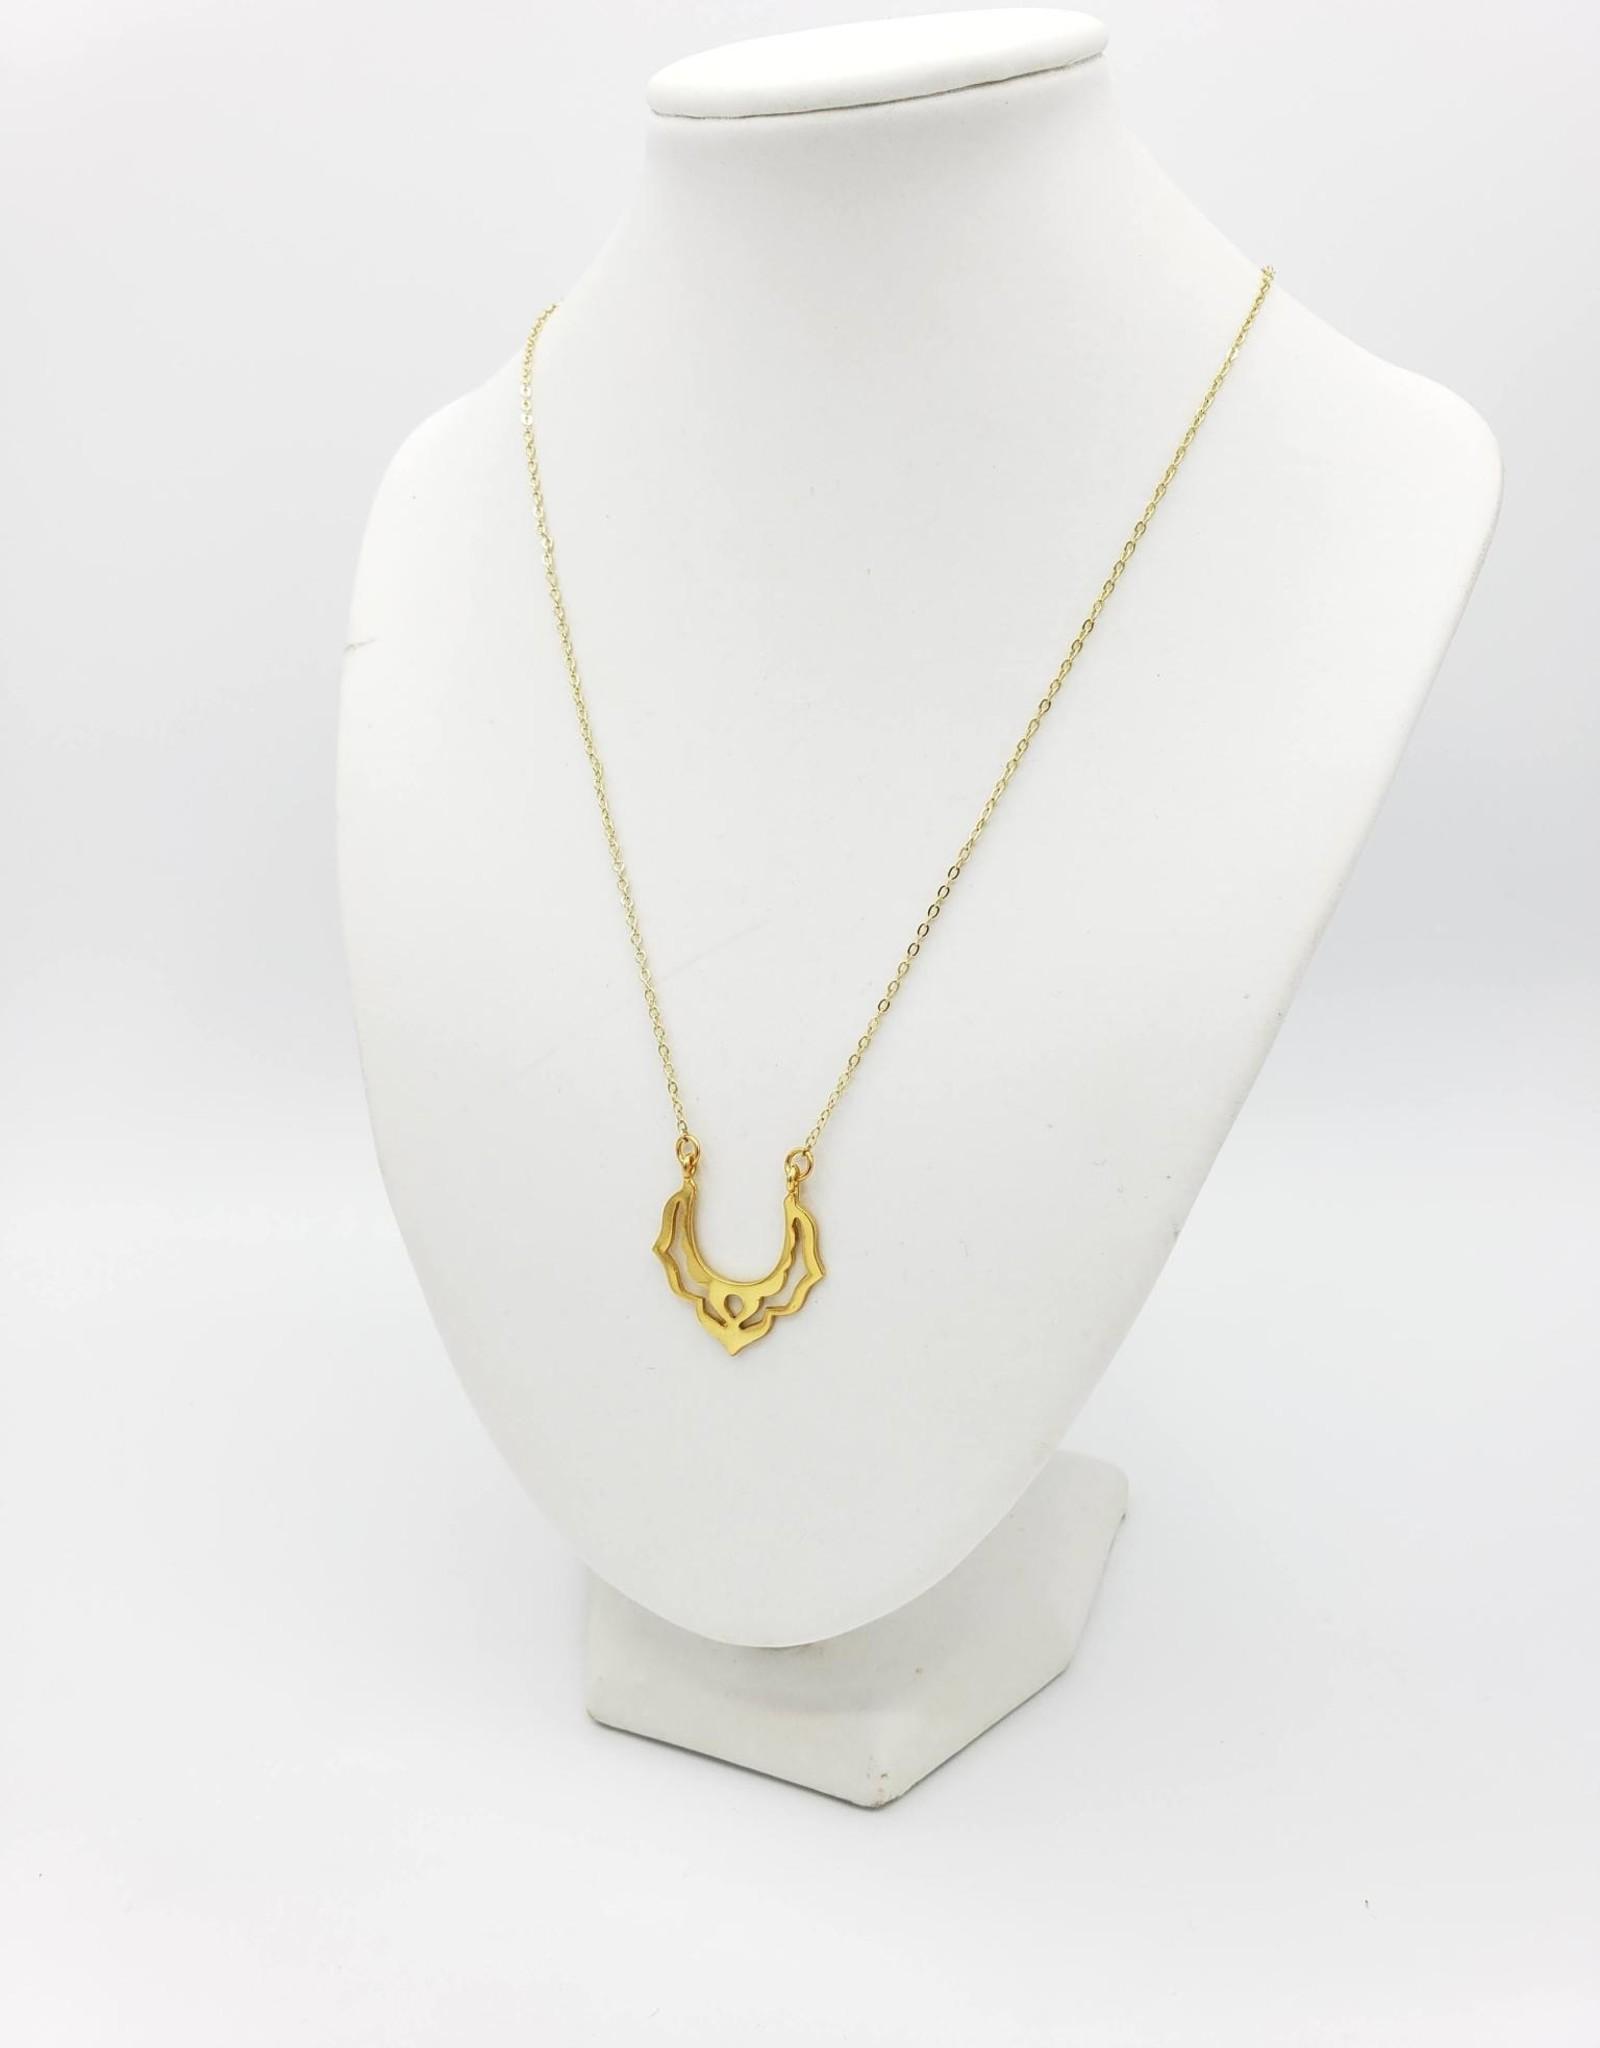 Mishakaudi Lotus Petal Necklace - gold plated